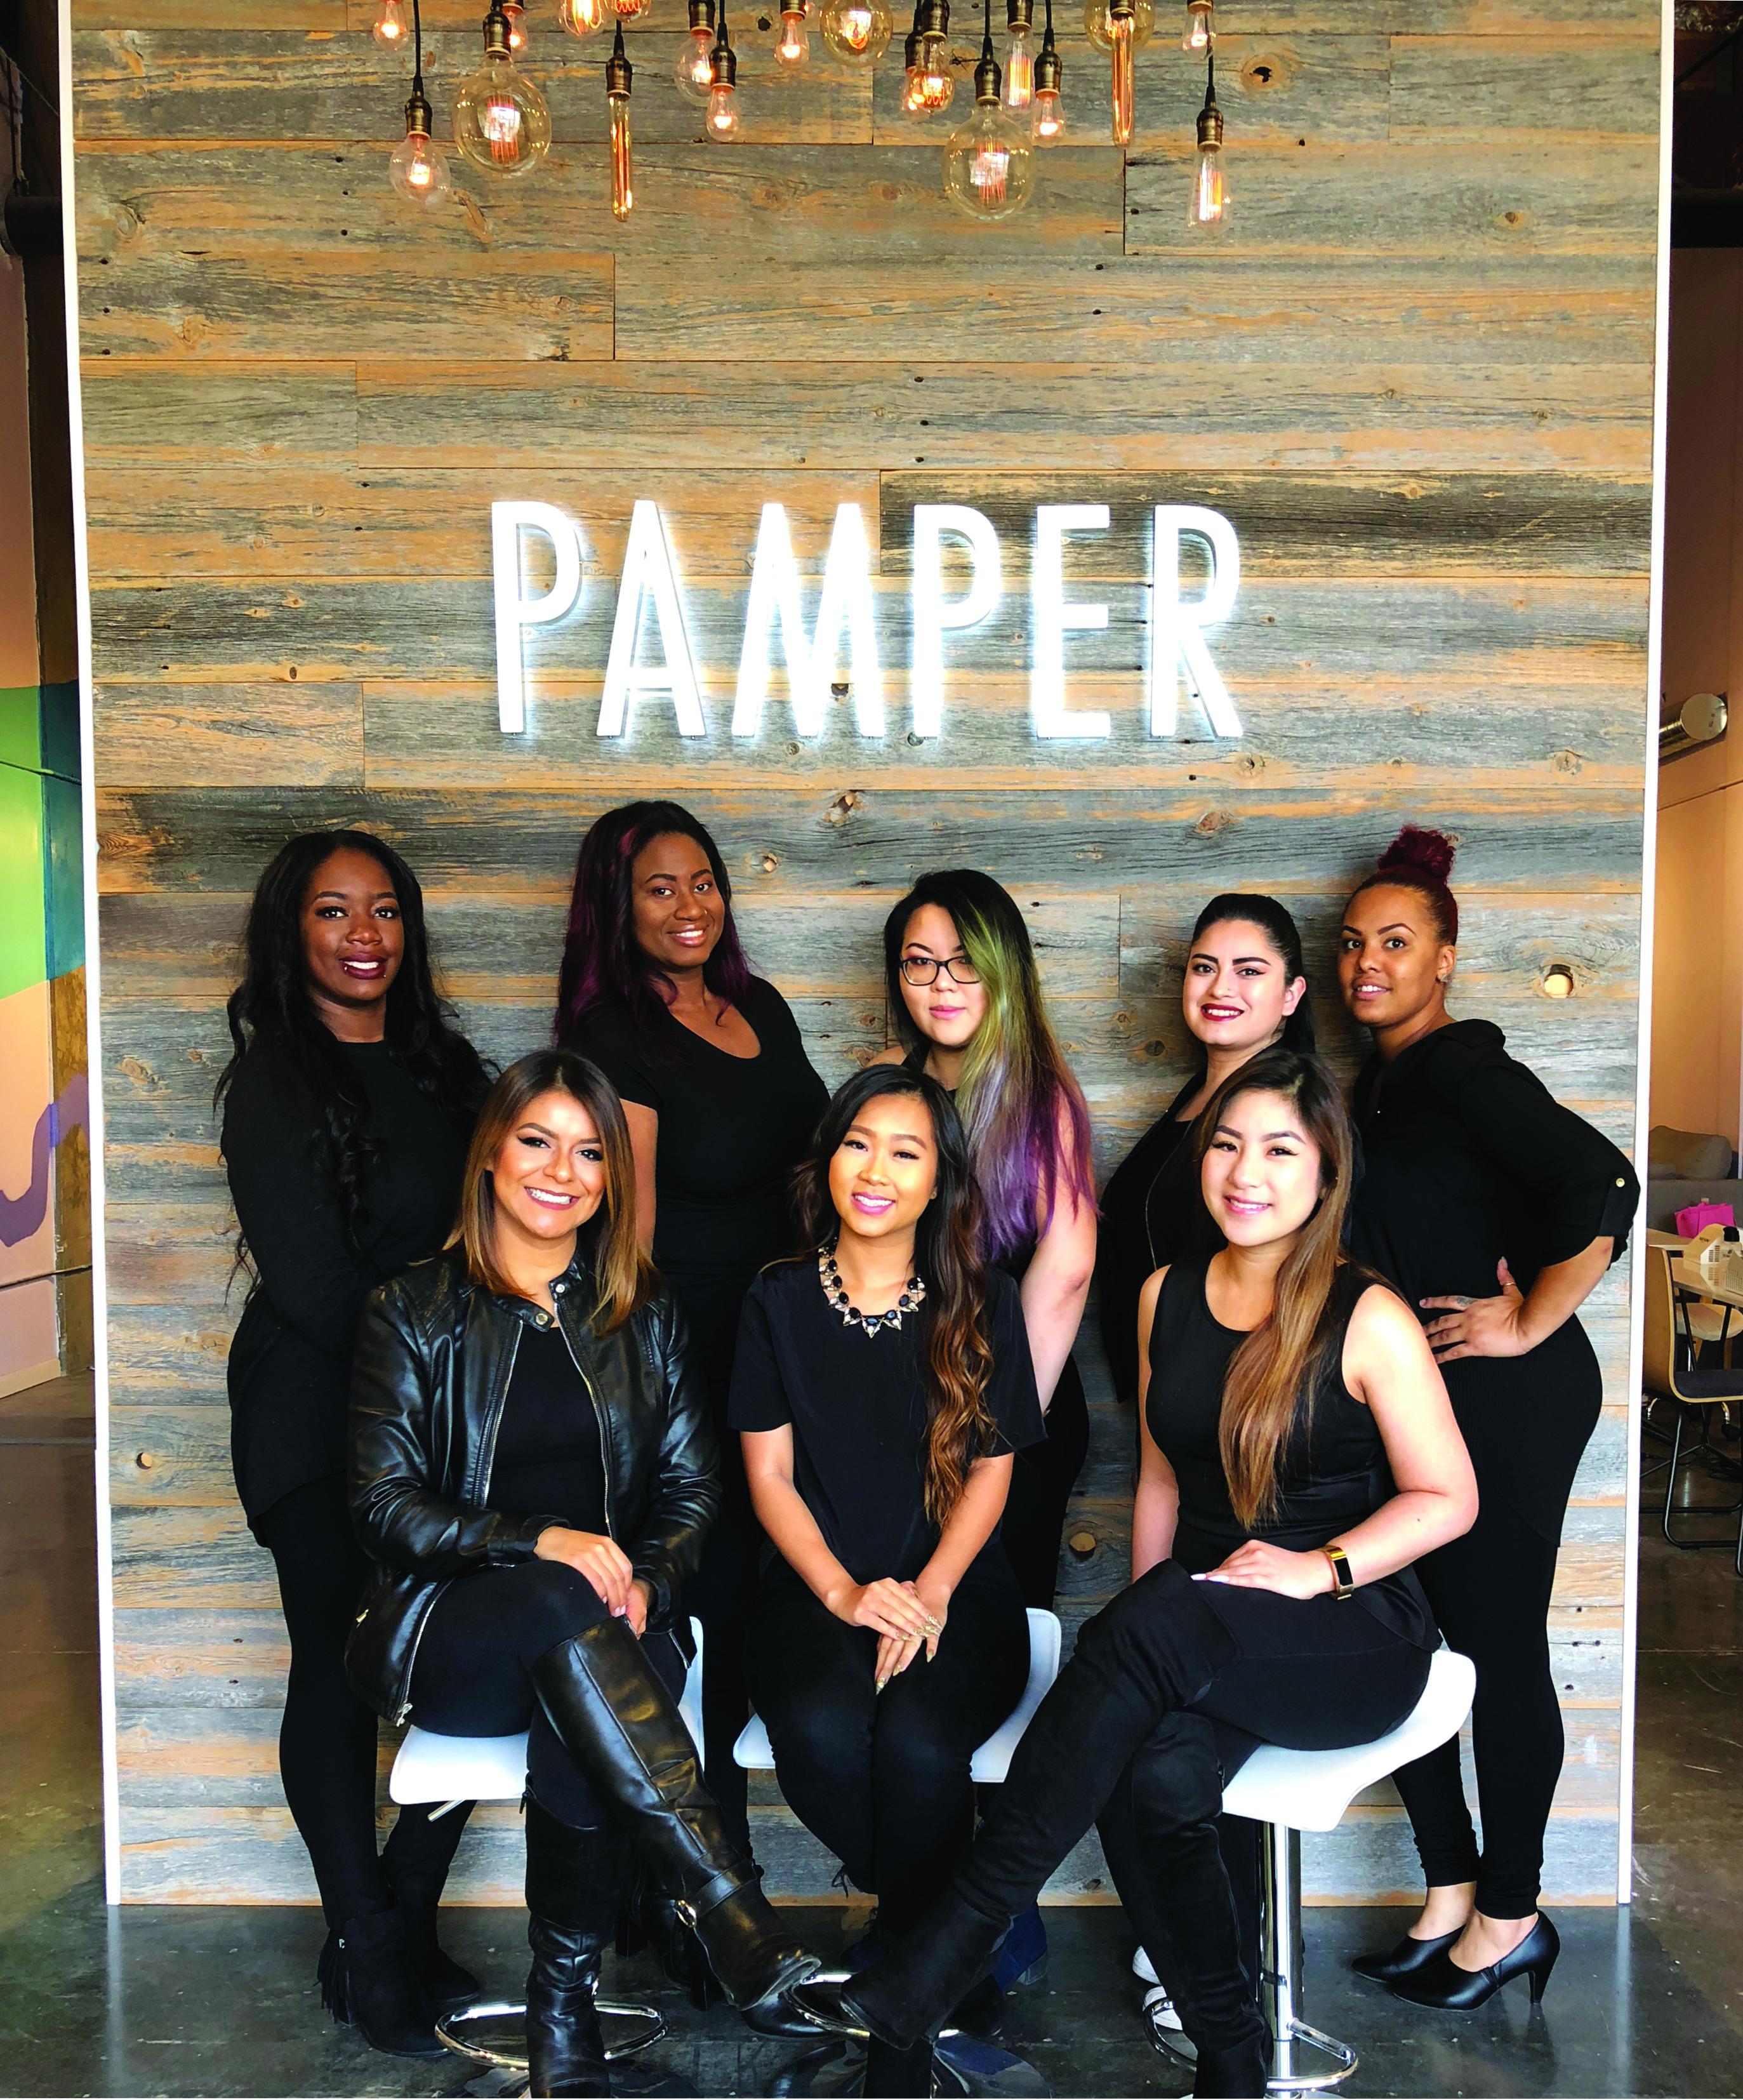 Pamper Nail Gallery: